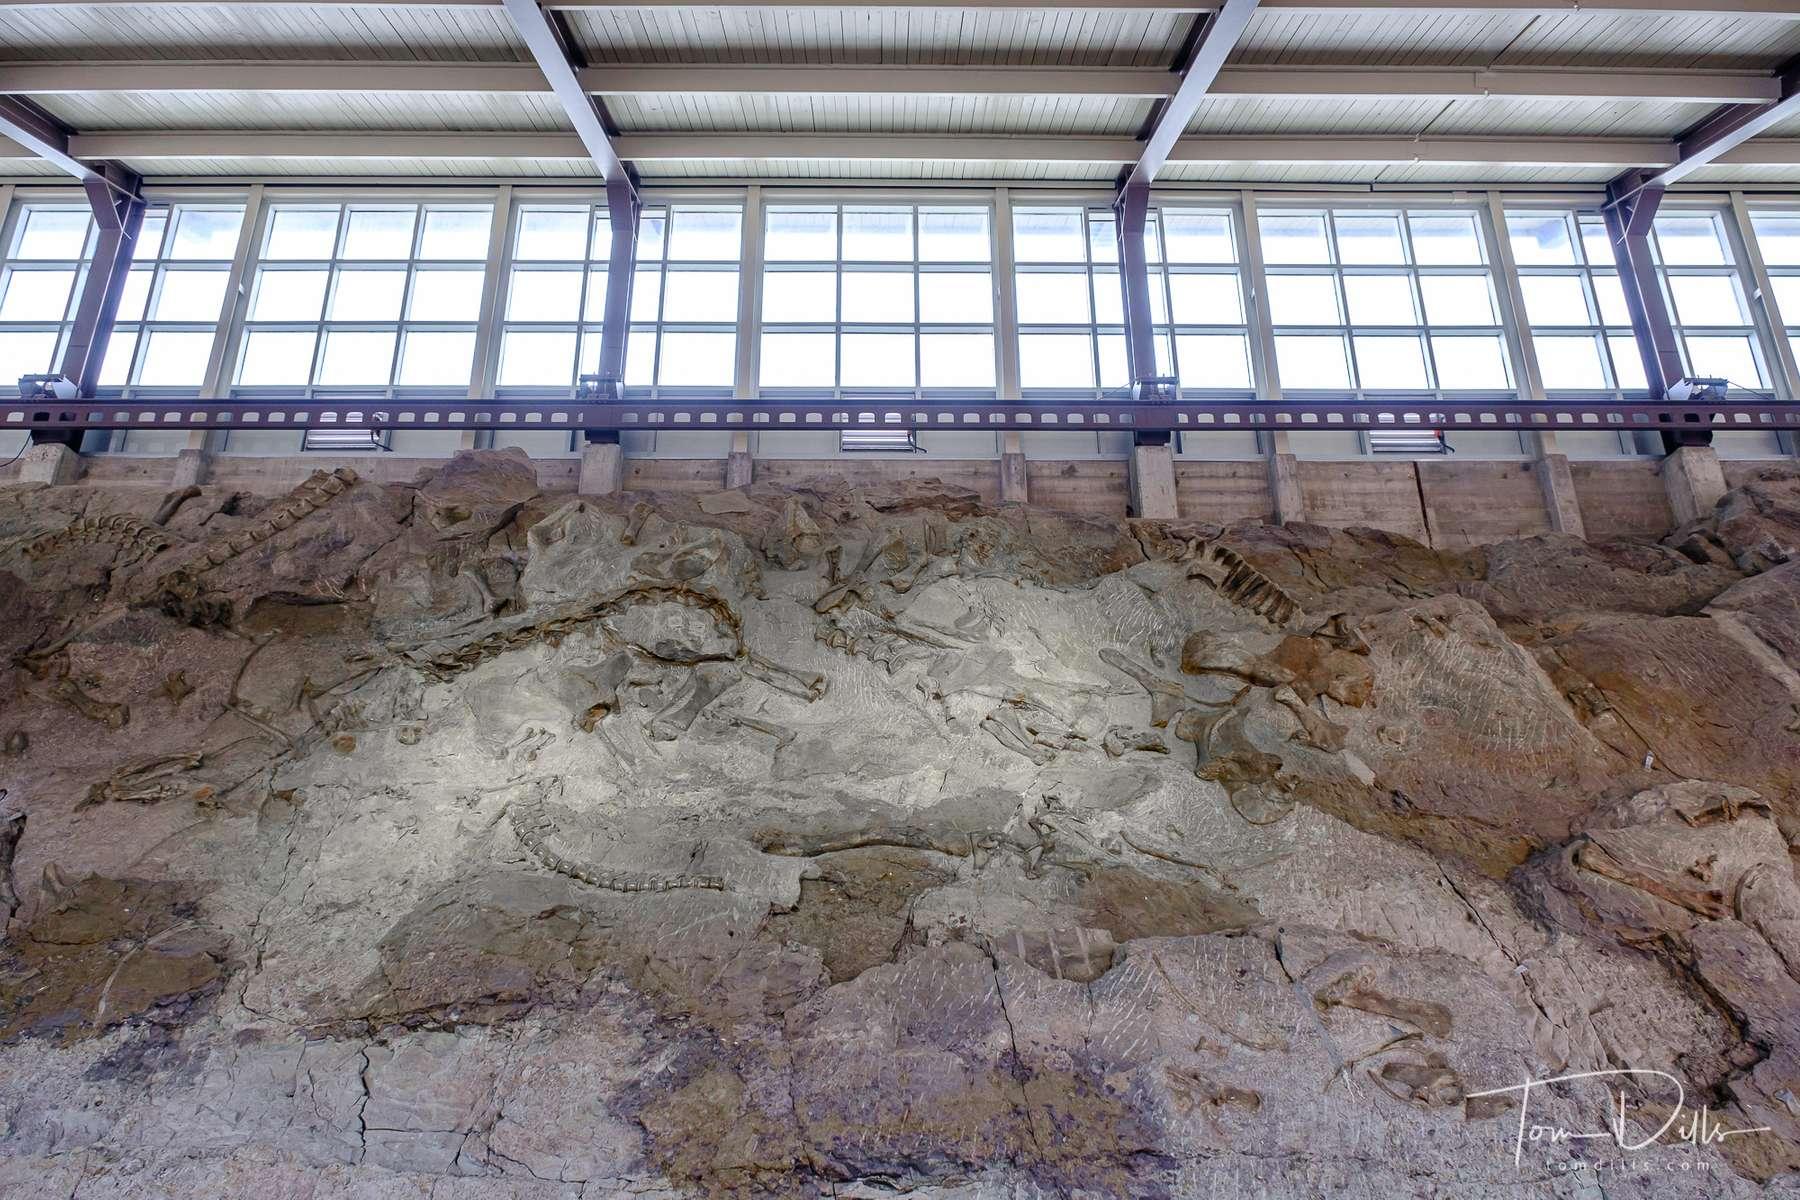 Quarry Exhibit Hall and the wall of dinosaur bones at Dinosaur National Monument near Jensen, Utah